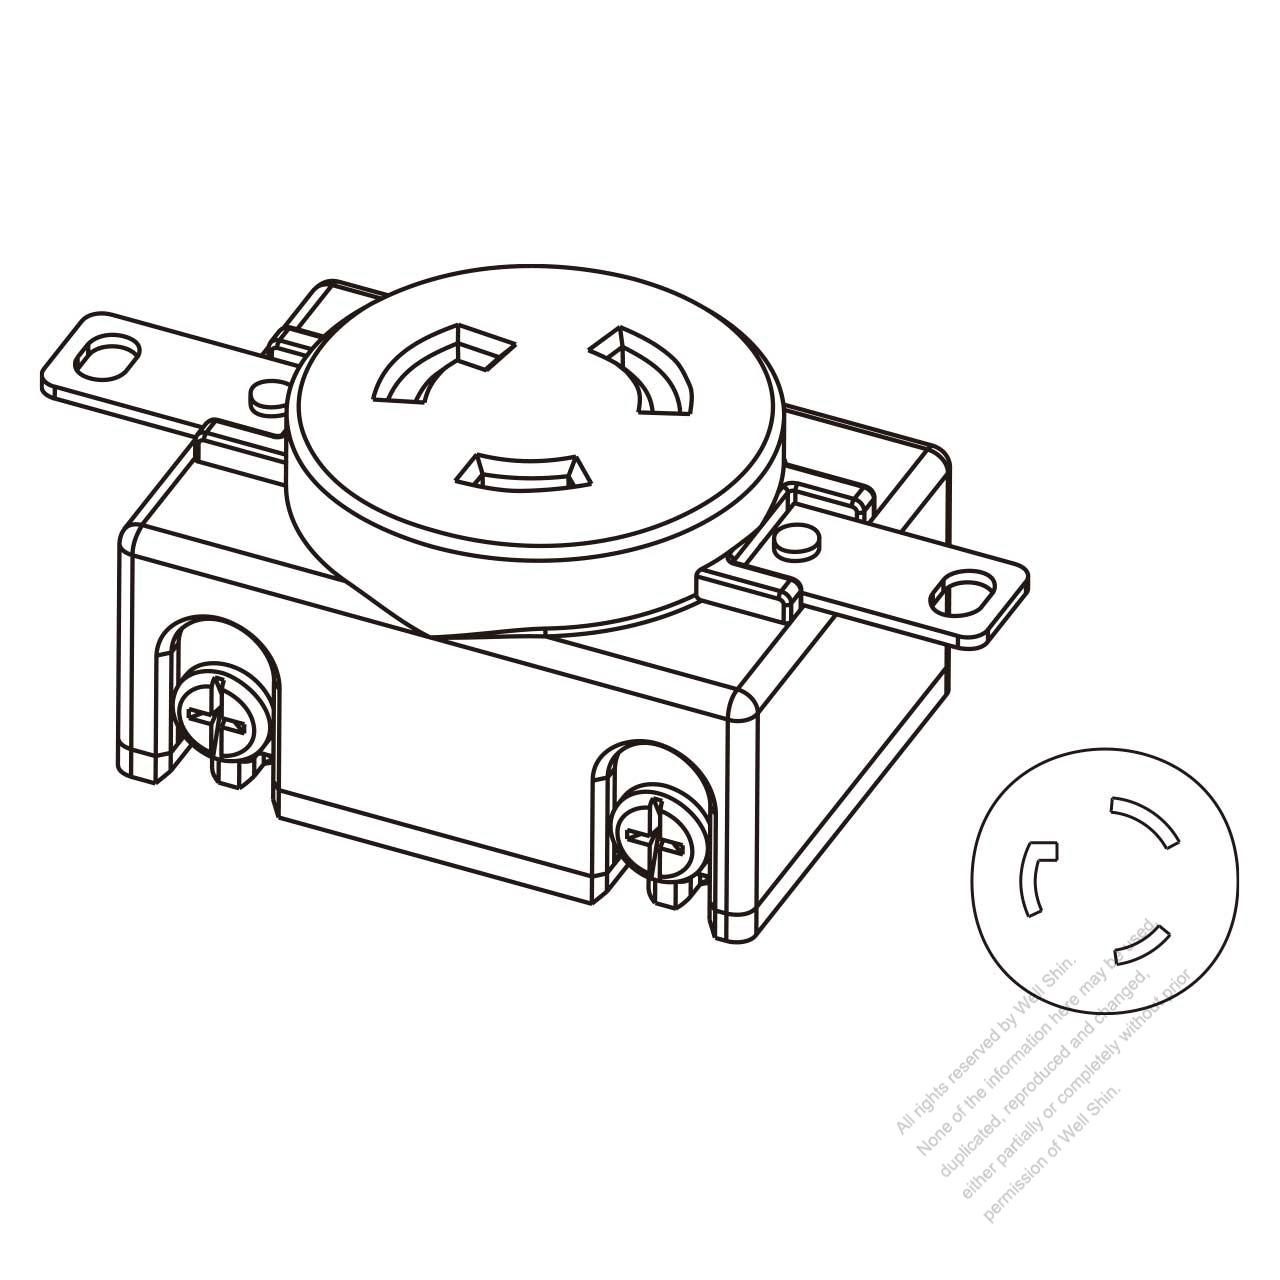 usa  canada locking single flush receptacle nema l6-20r  2 p 3 wire grounding 20a 250v